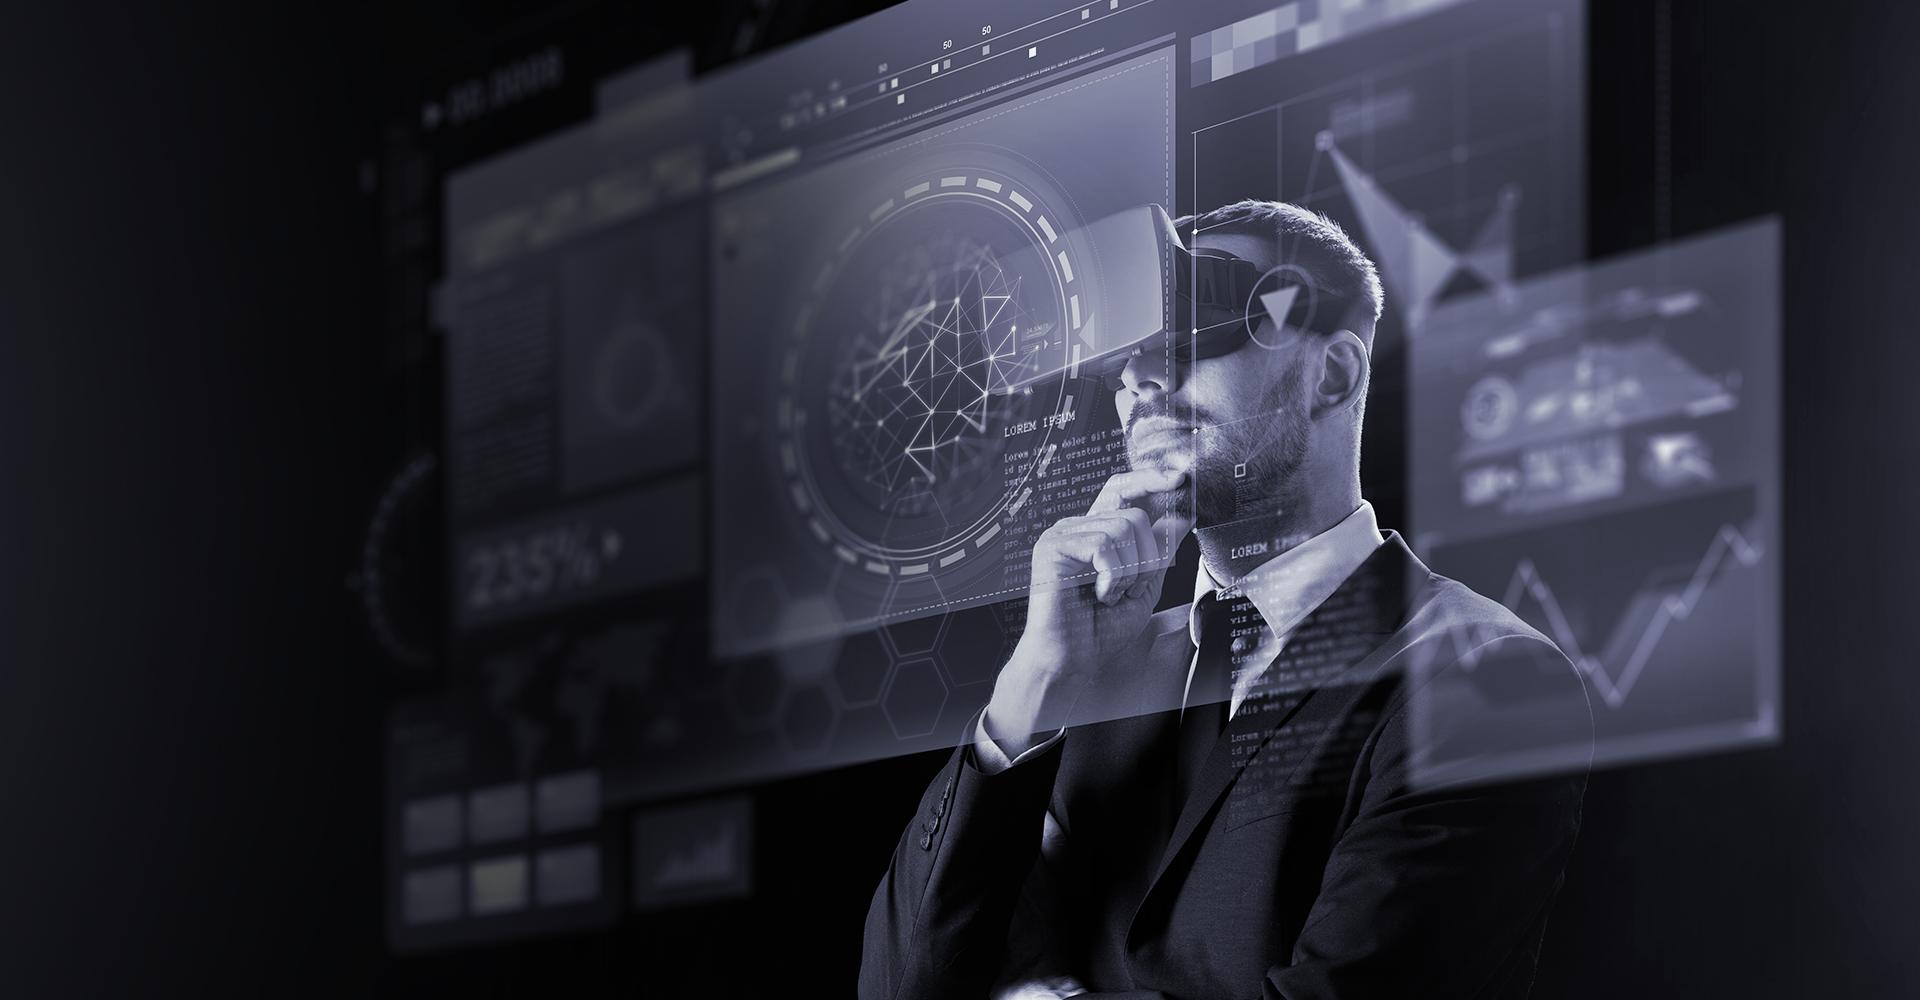 GridRaster raises $2.4M to win enterprise mixed reality